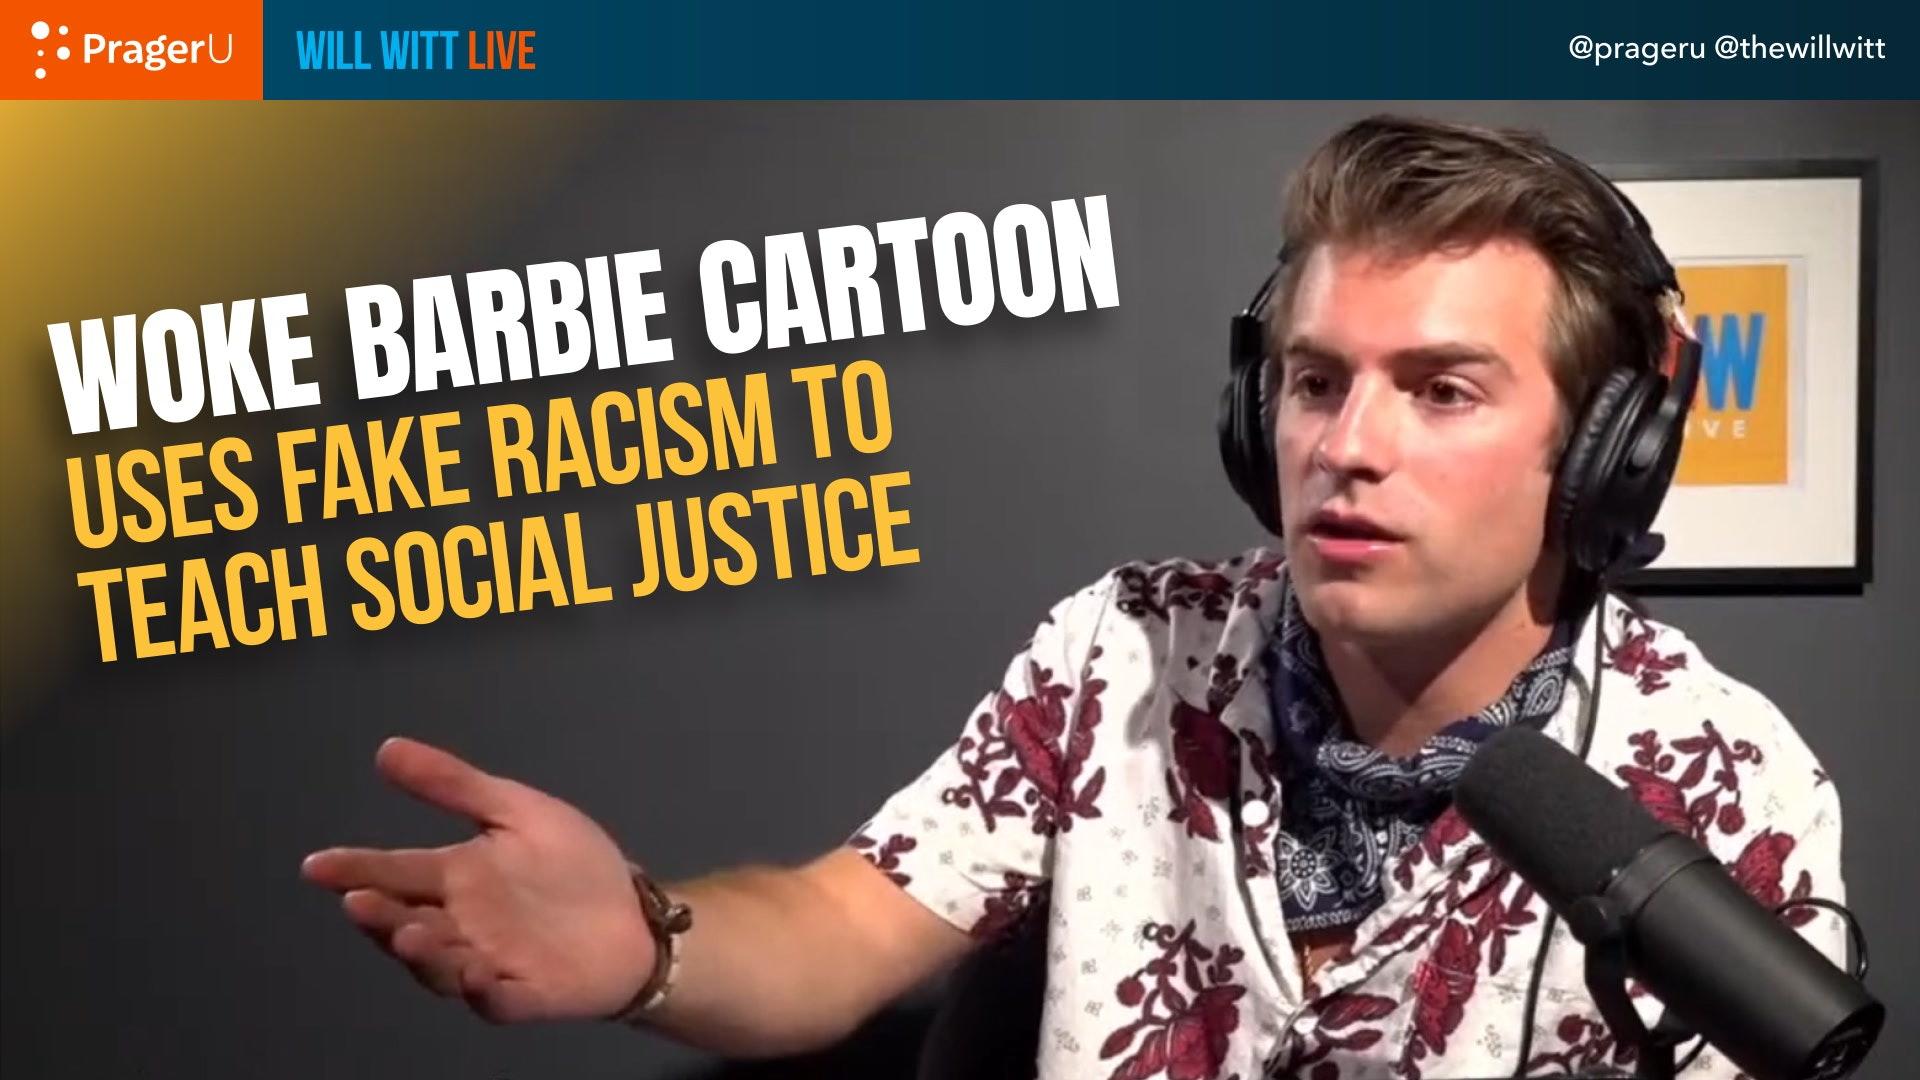 Barbie Cartoon Fakes Racism to Indoctrinate Children